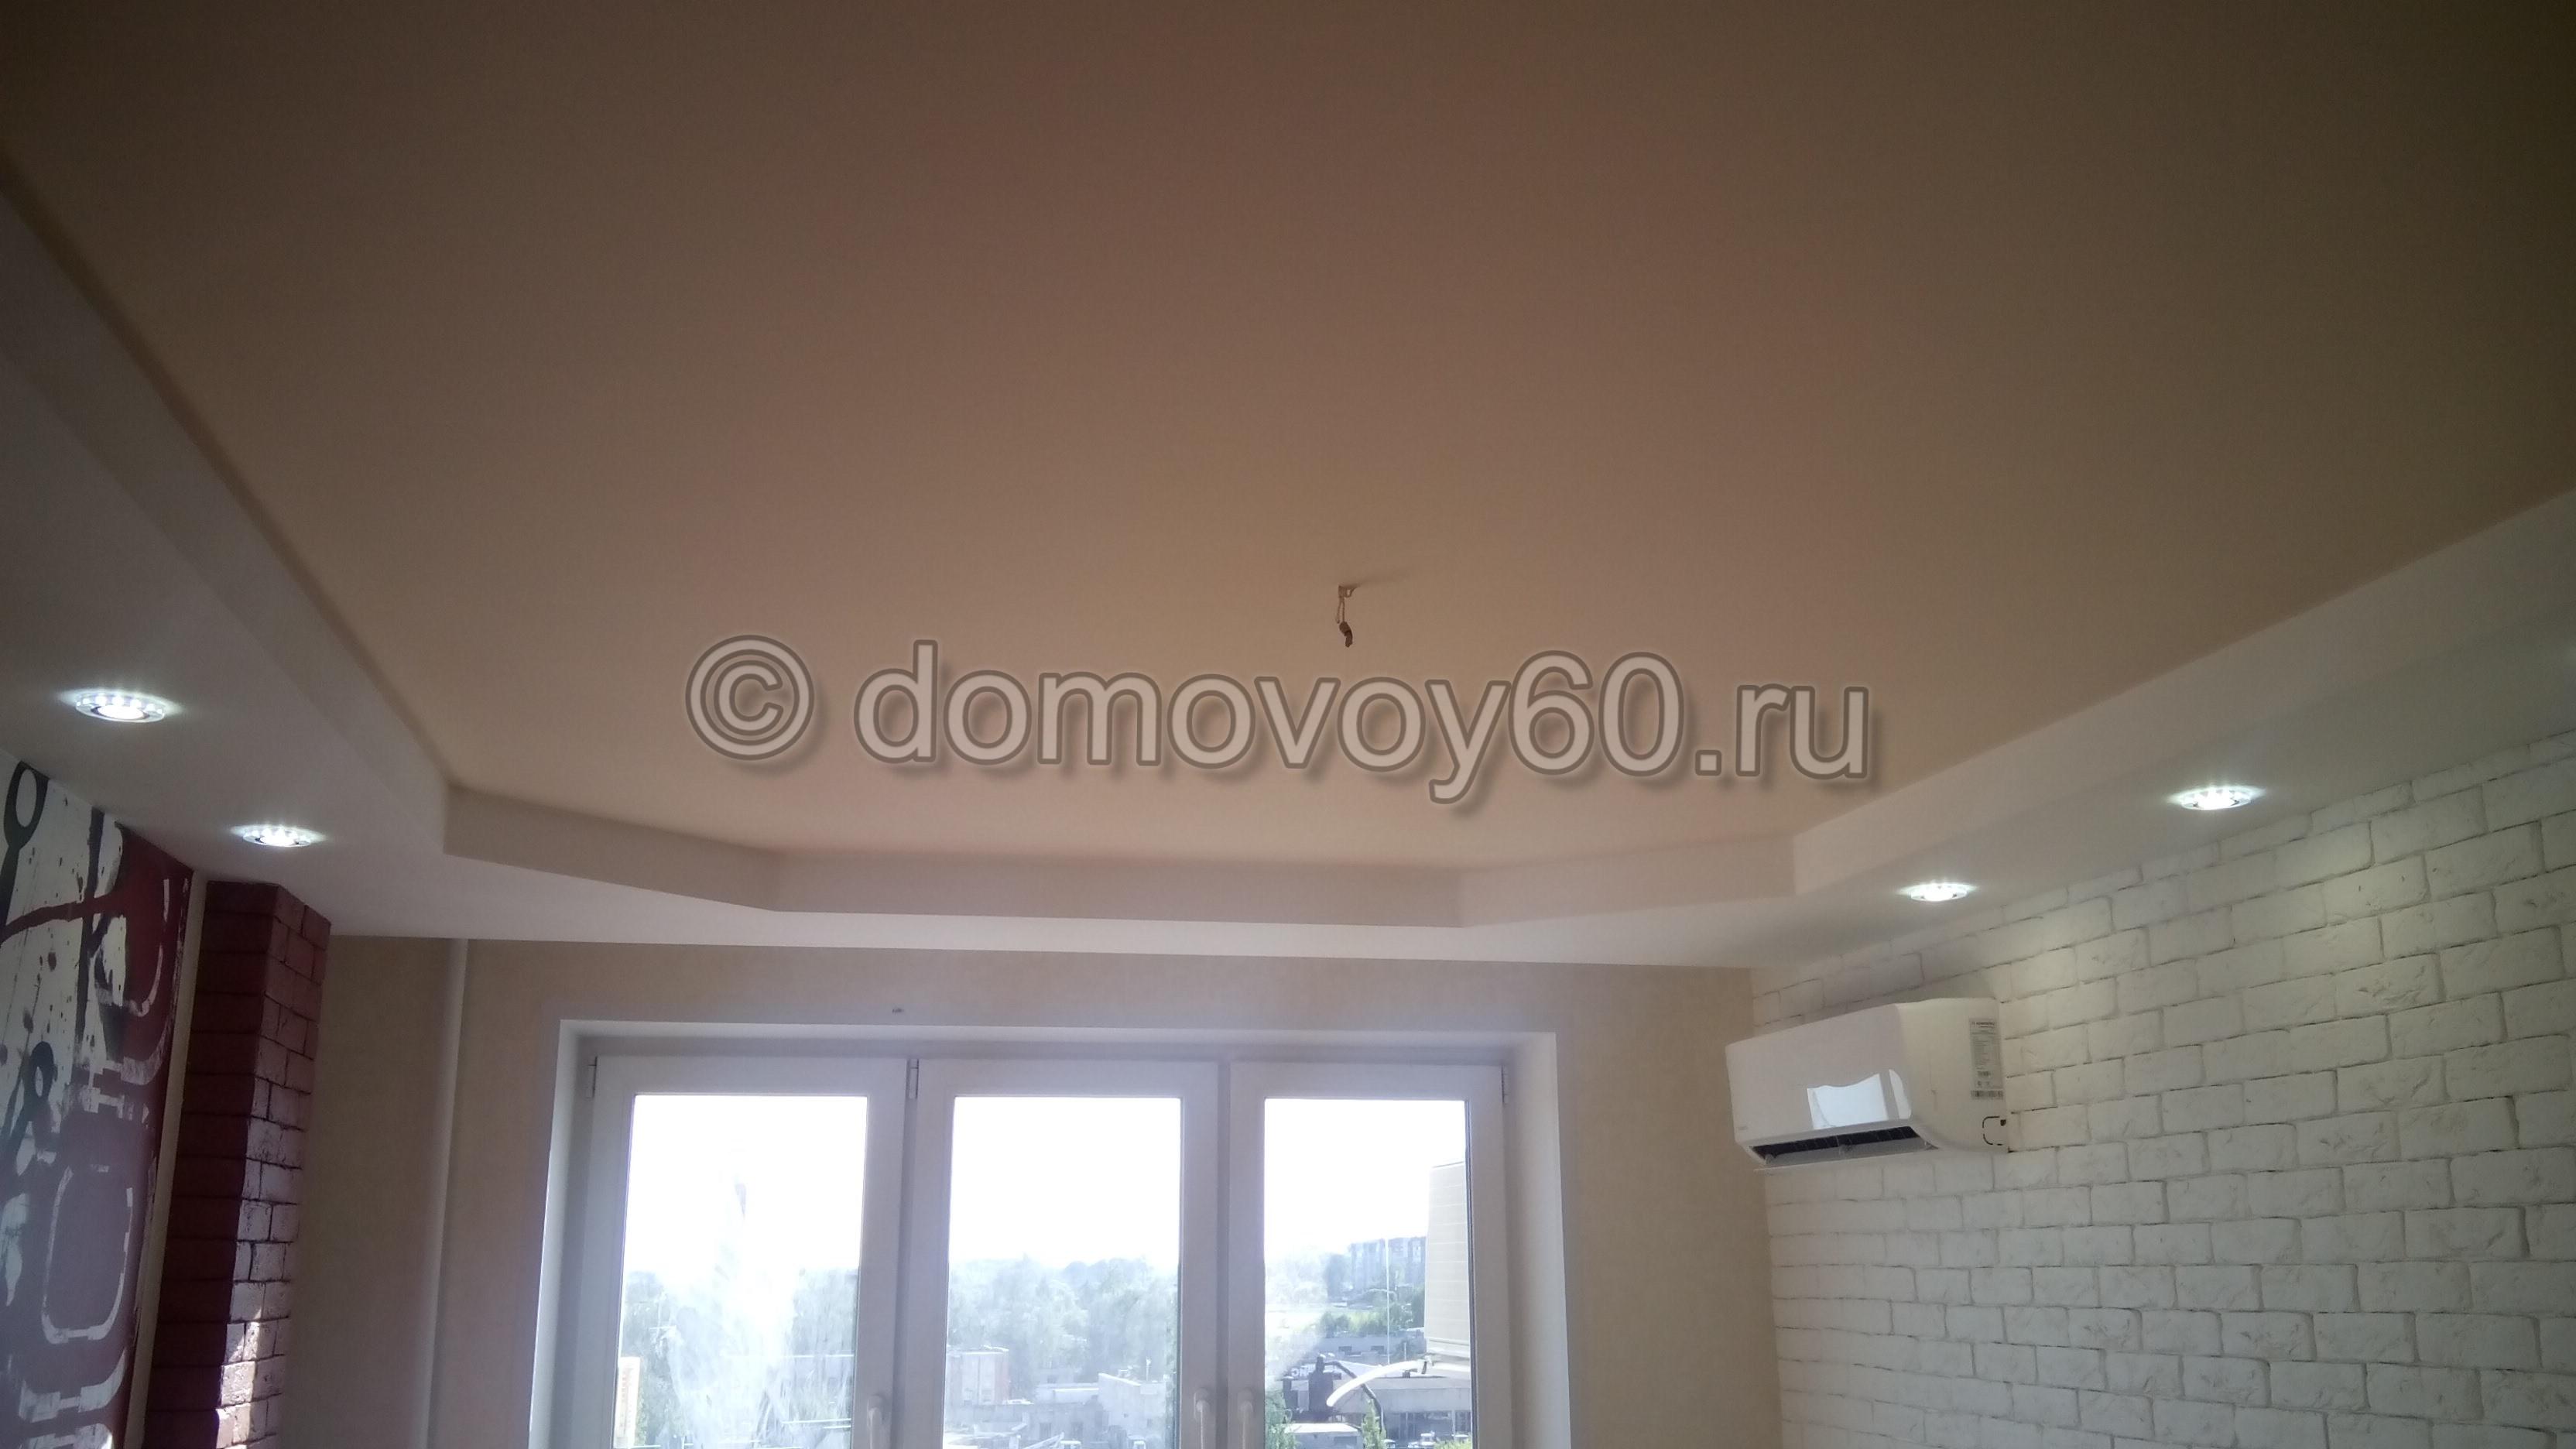 domovoy60-042